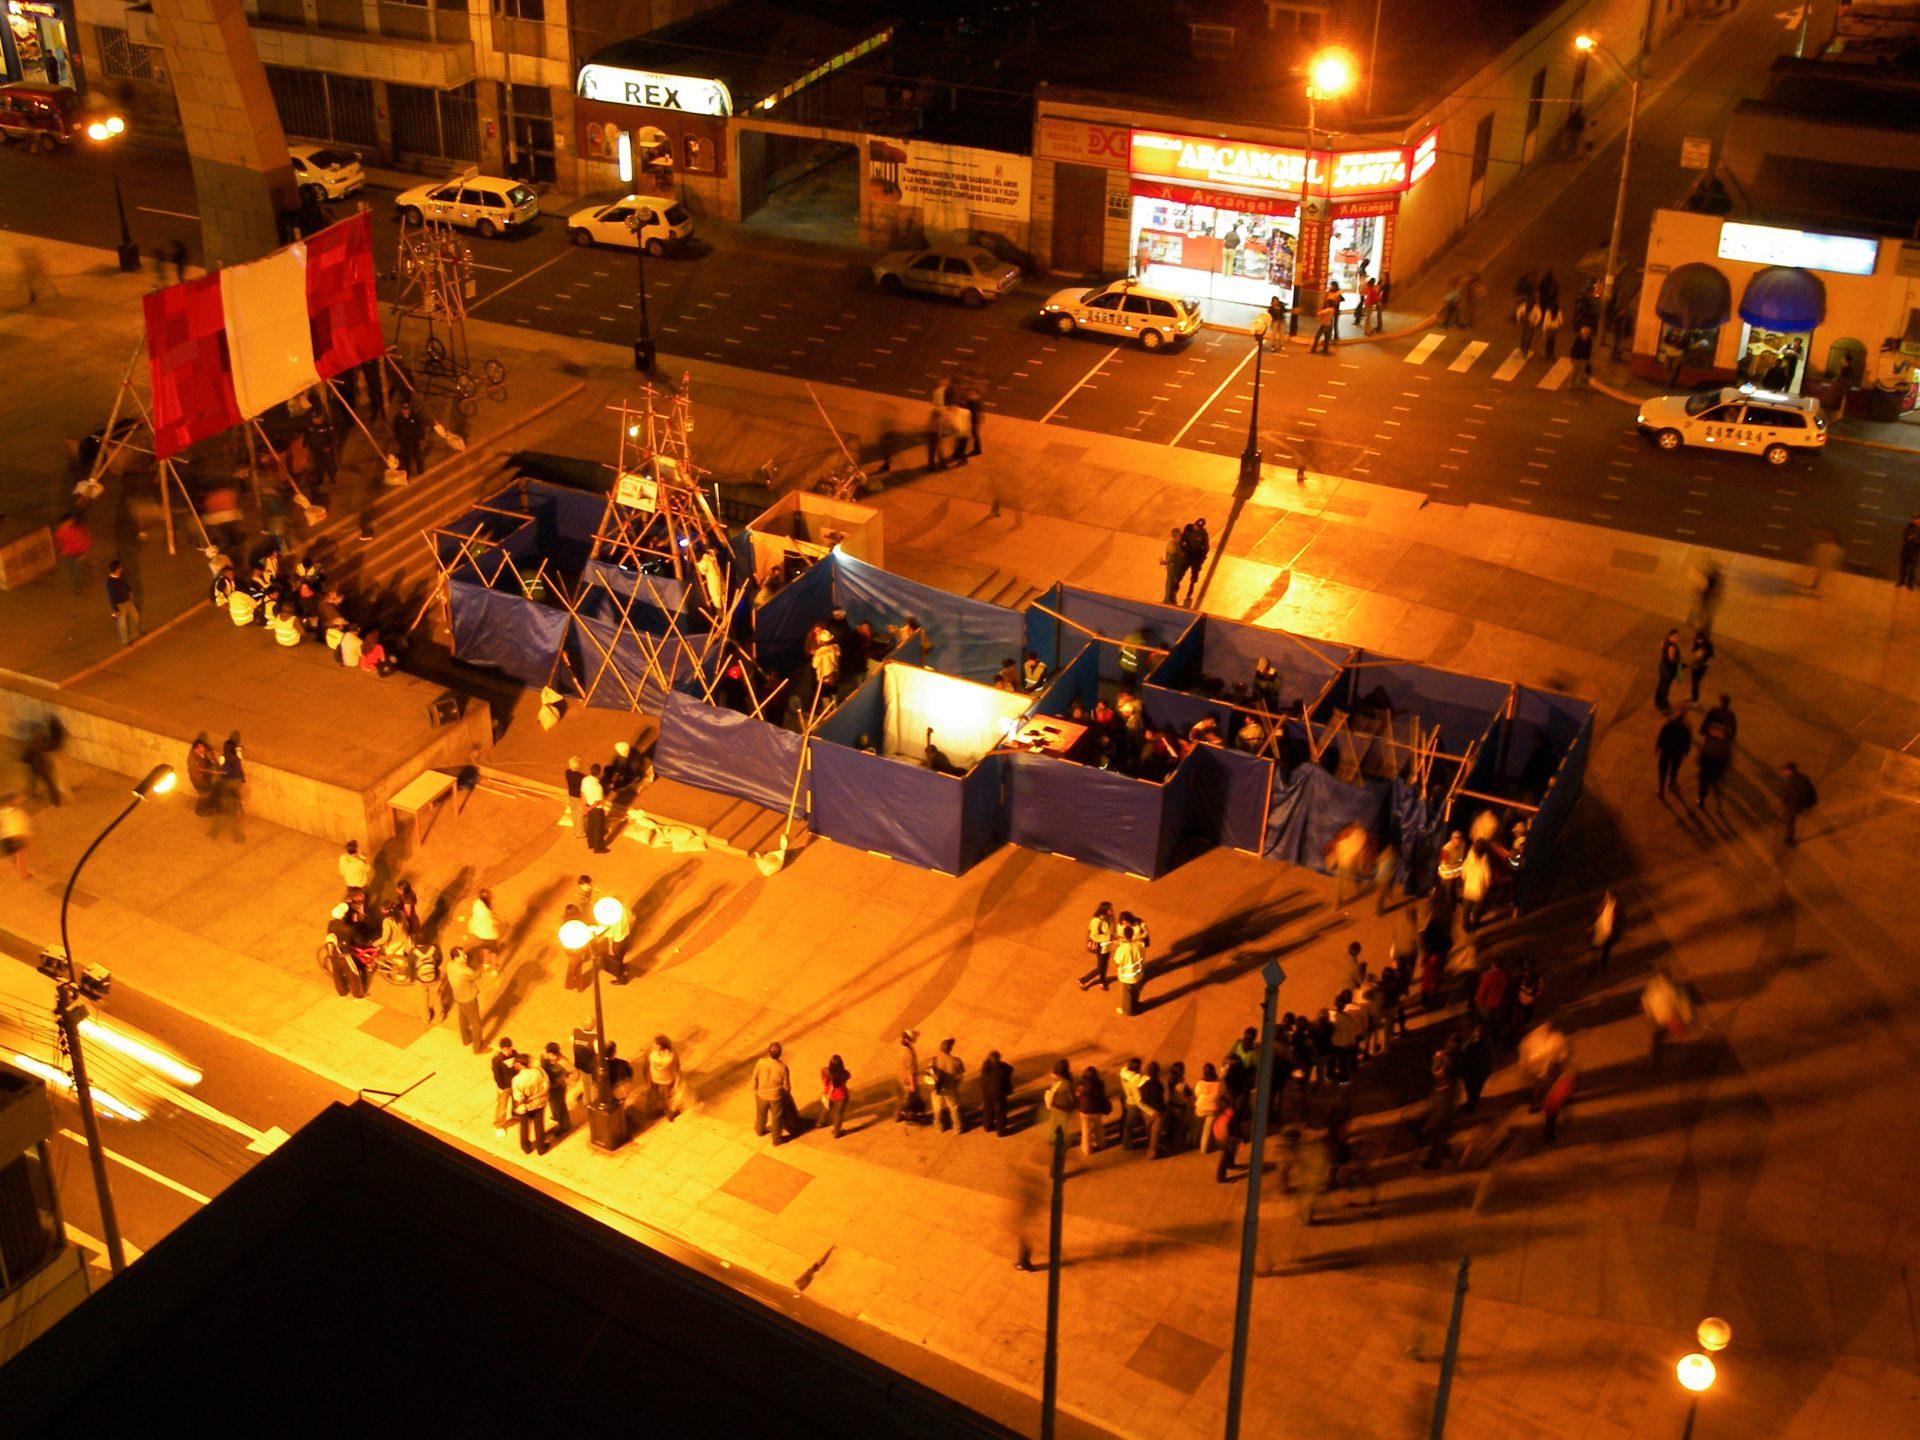 2008_peru_desierto_present2_plaza_dearmastacna_1